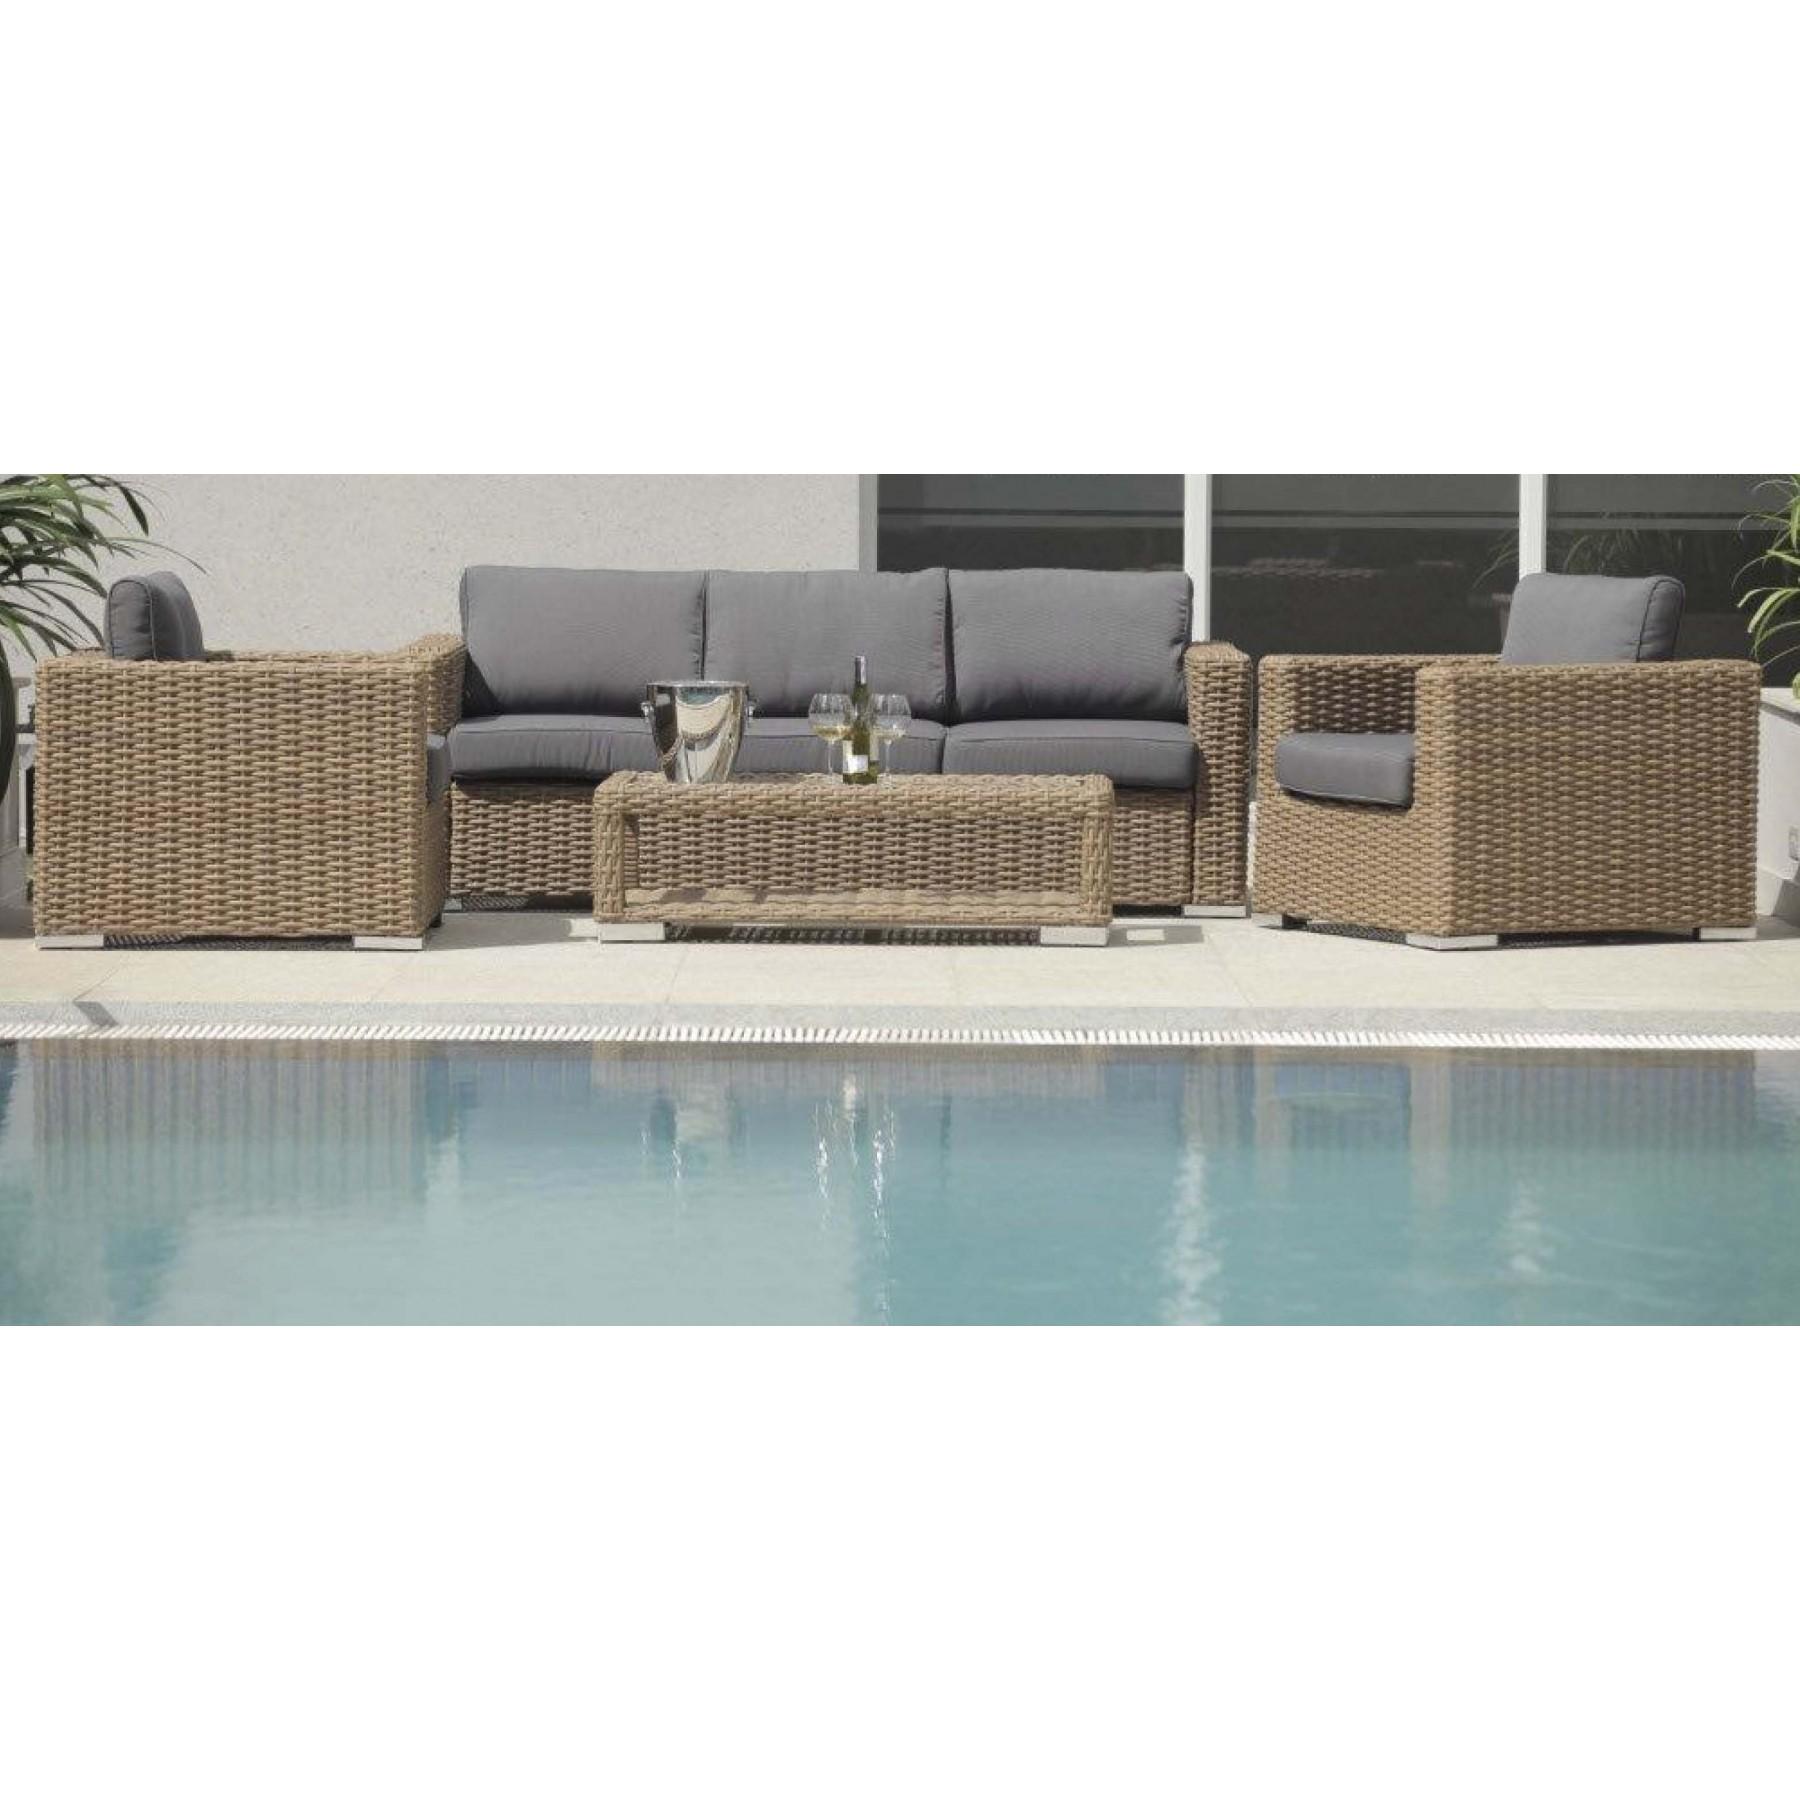 Sillas Mesas Tumbonas Sofas Ratan Sintetico Fibra Jardin Exterior  # Muebles Terraza Baratos